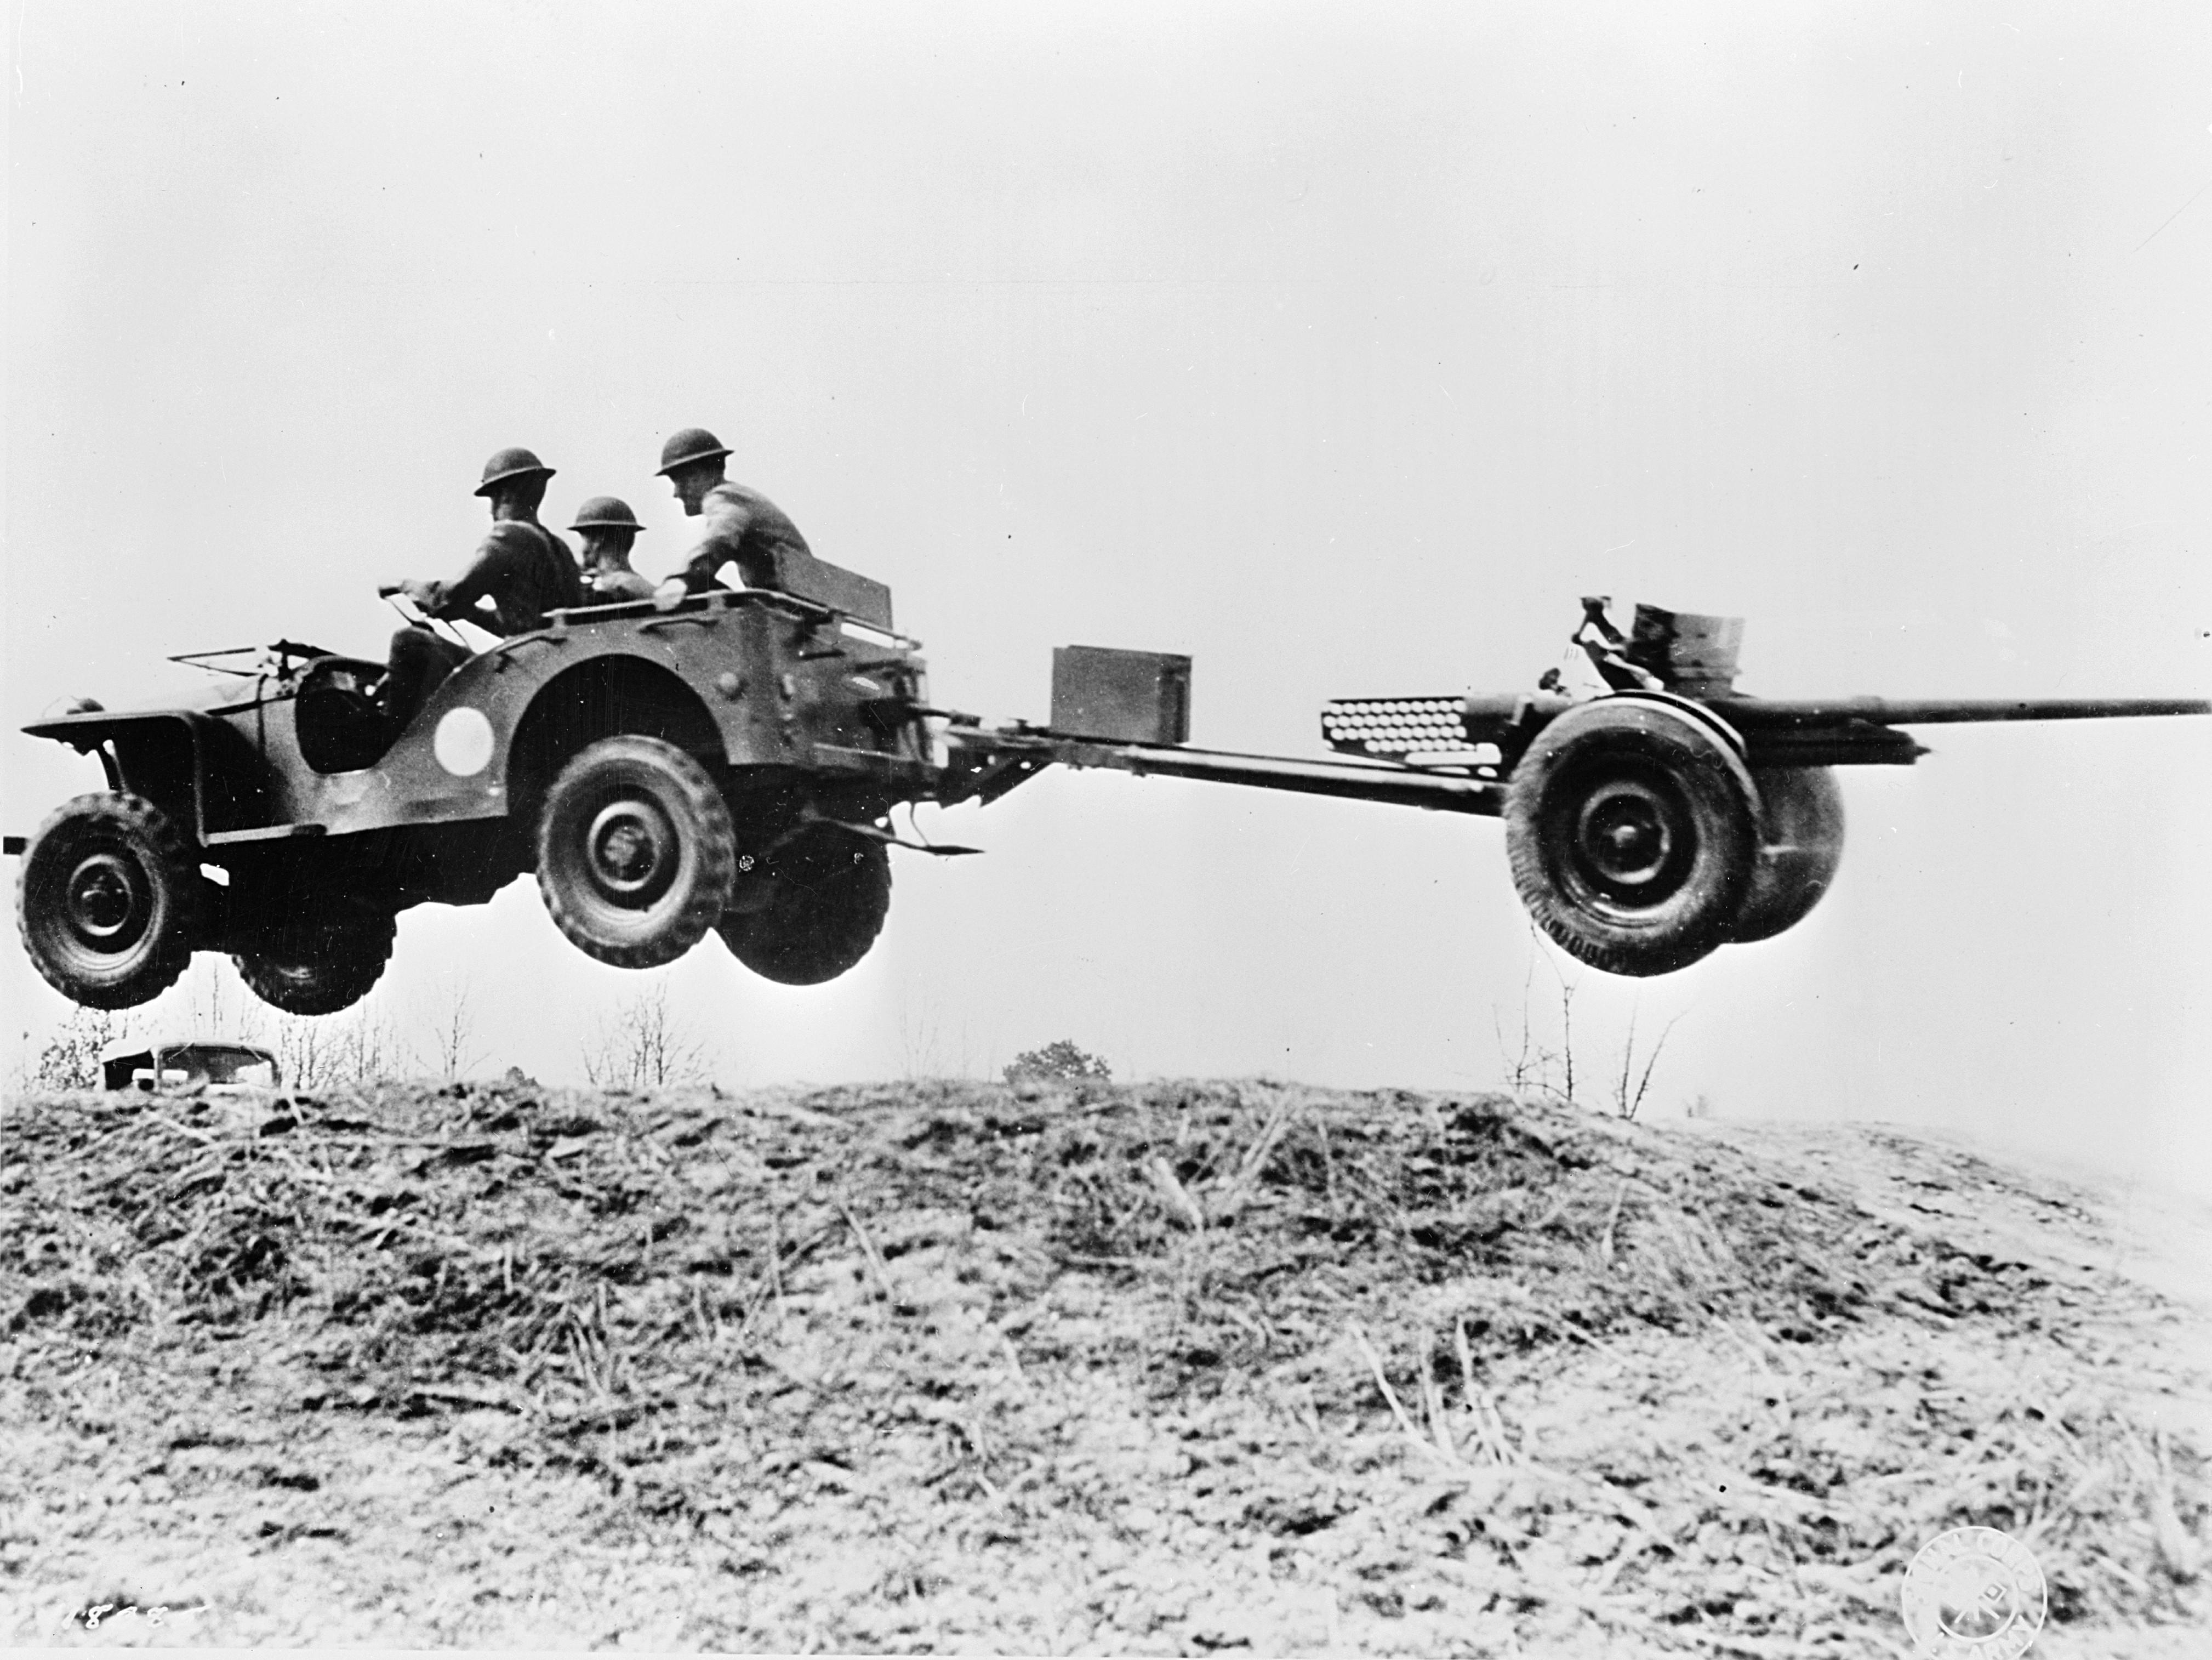 Bantam jeep flying 37mm